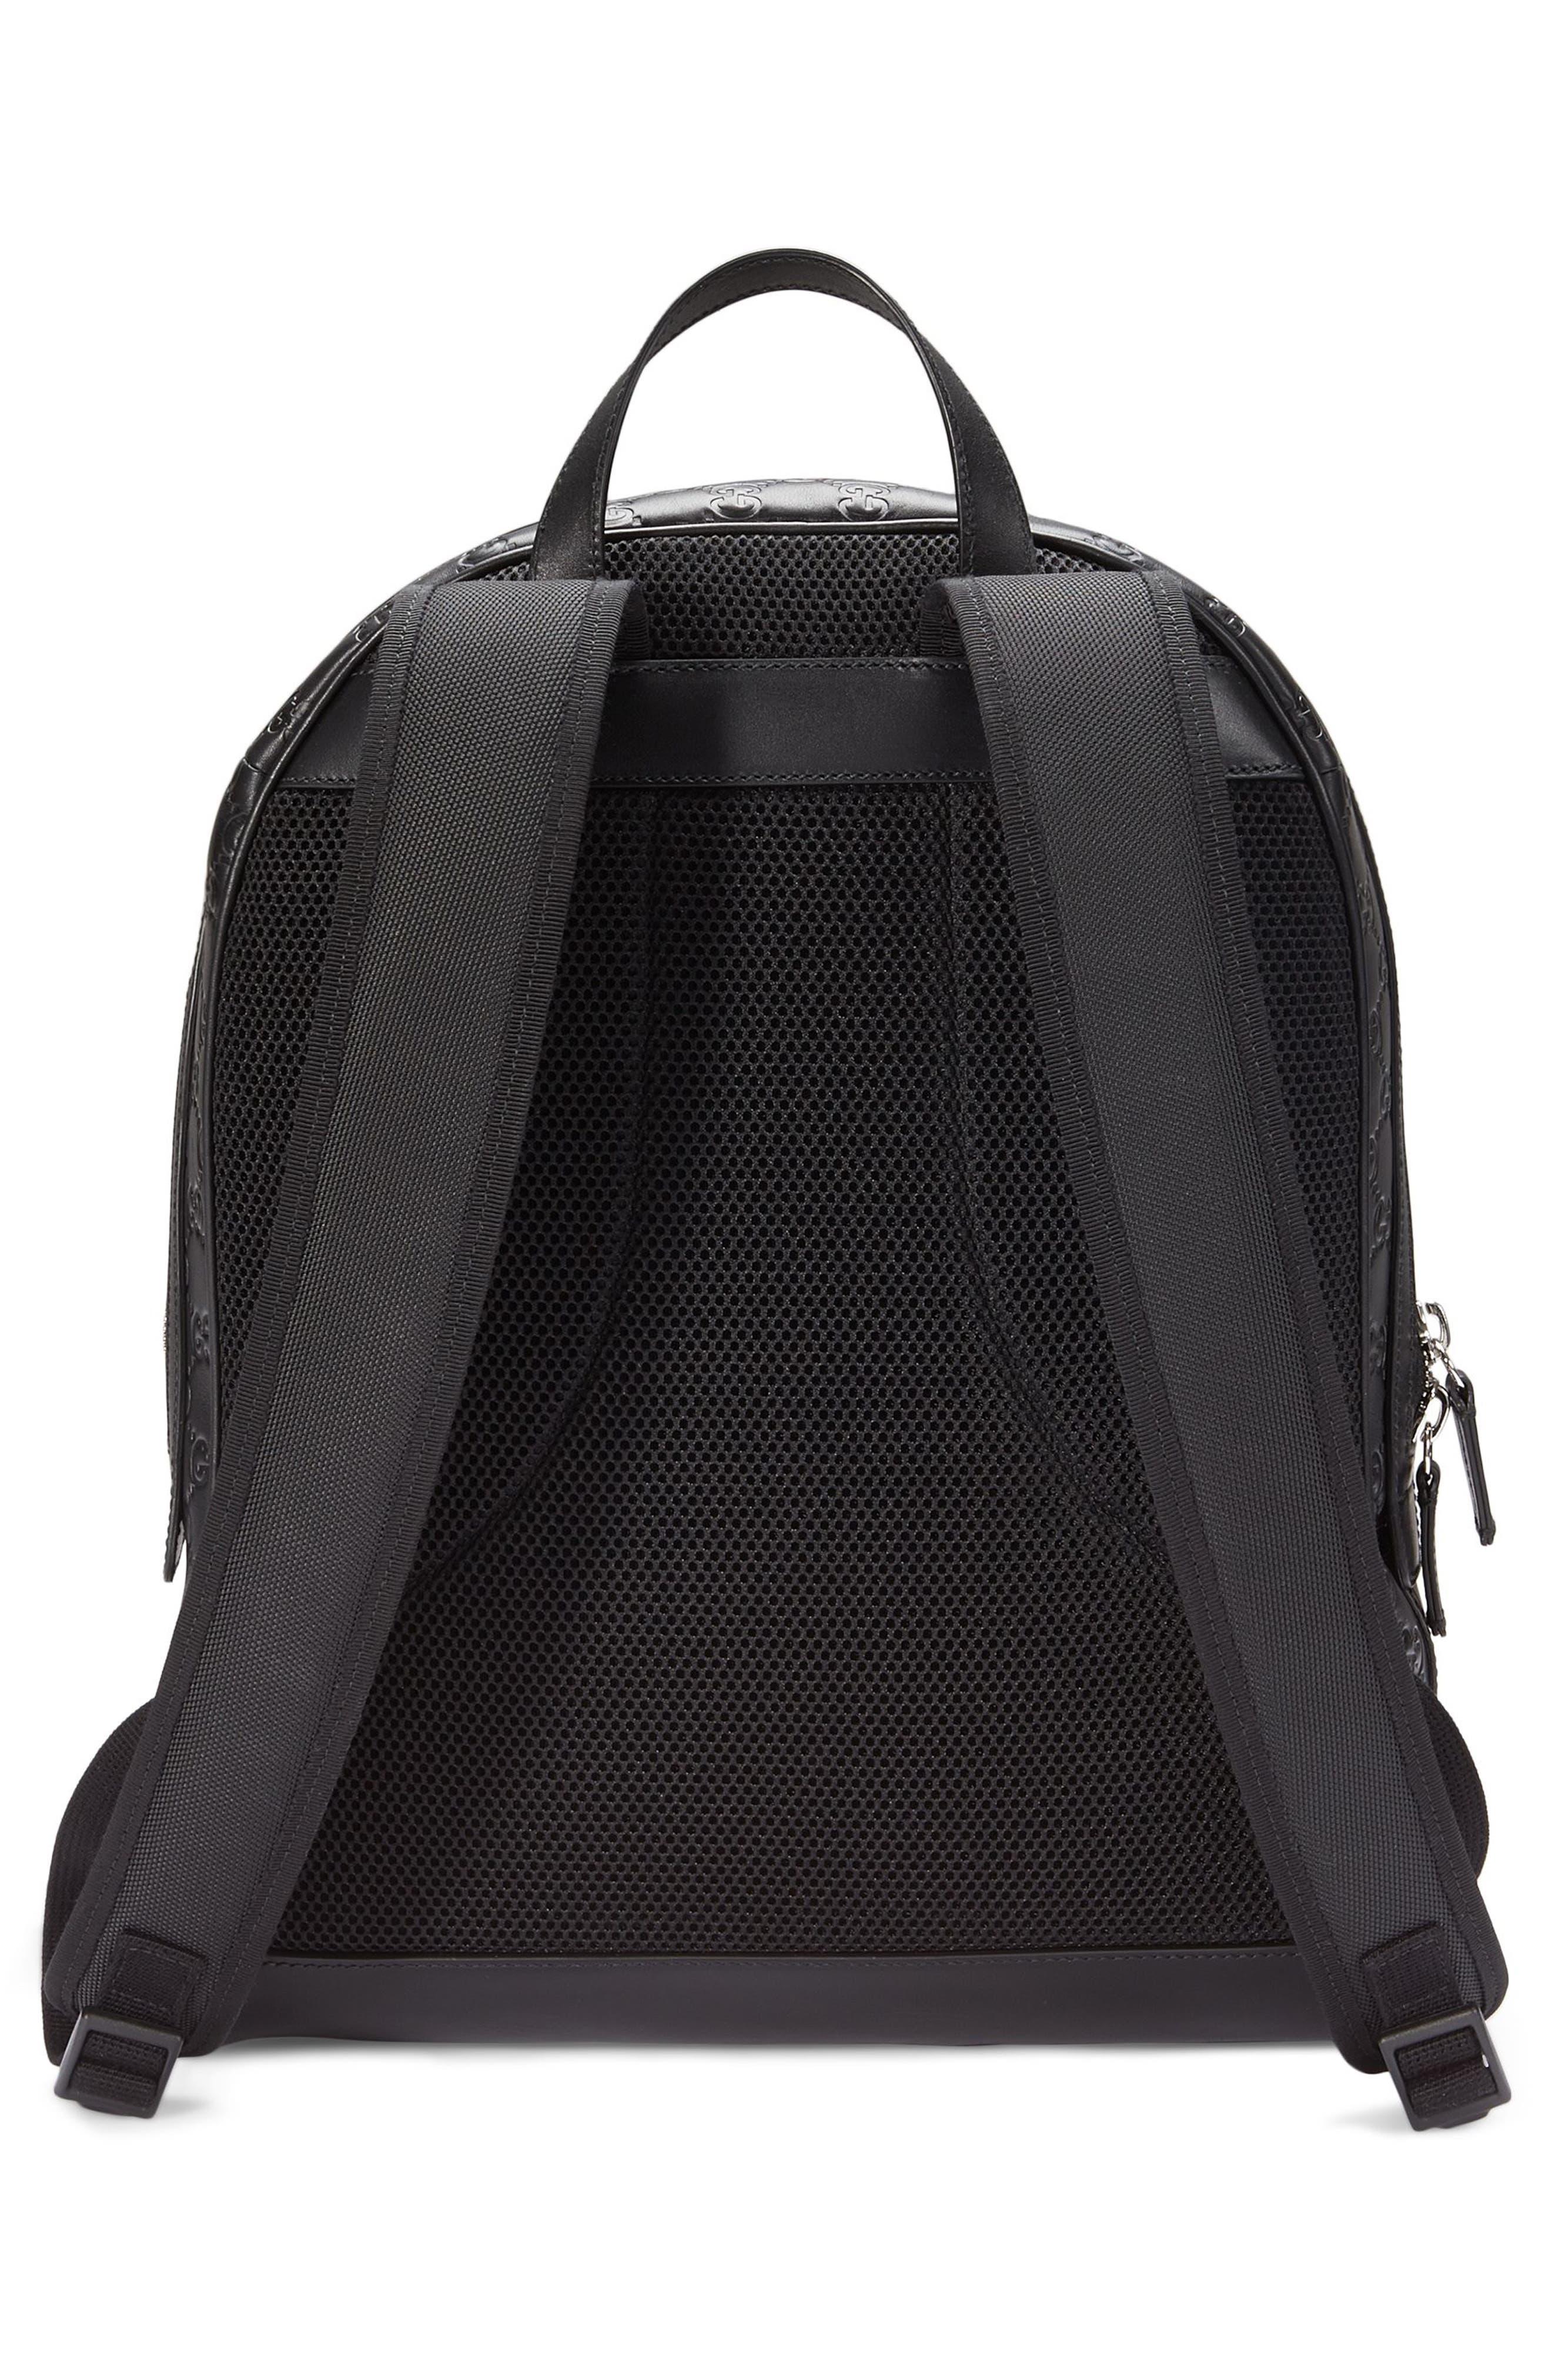 Embossed Leather Backpack,                             Alternate thumbnail 2, color,                             Black